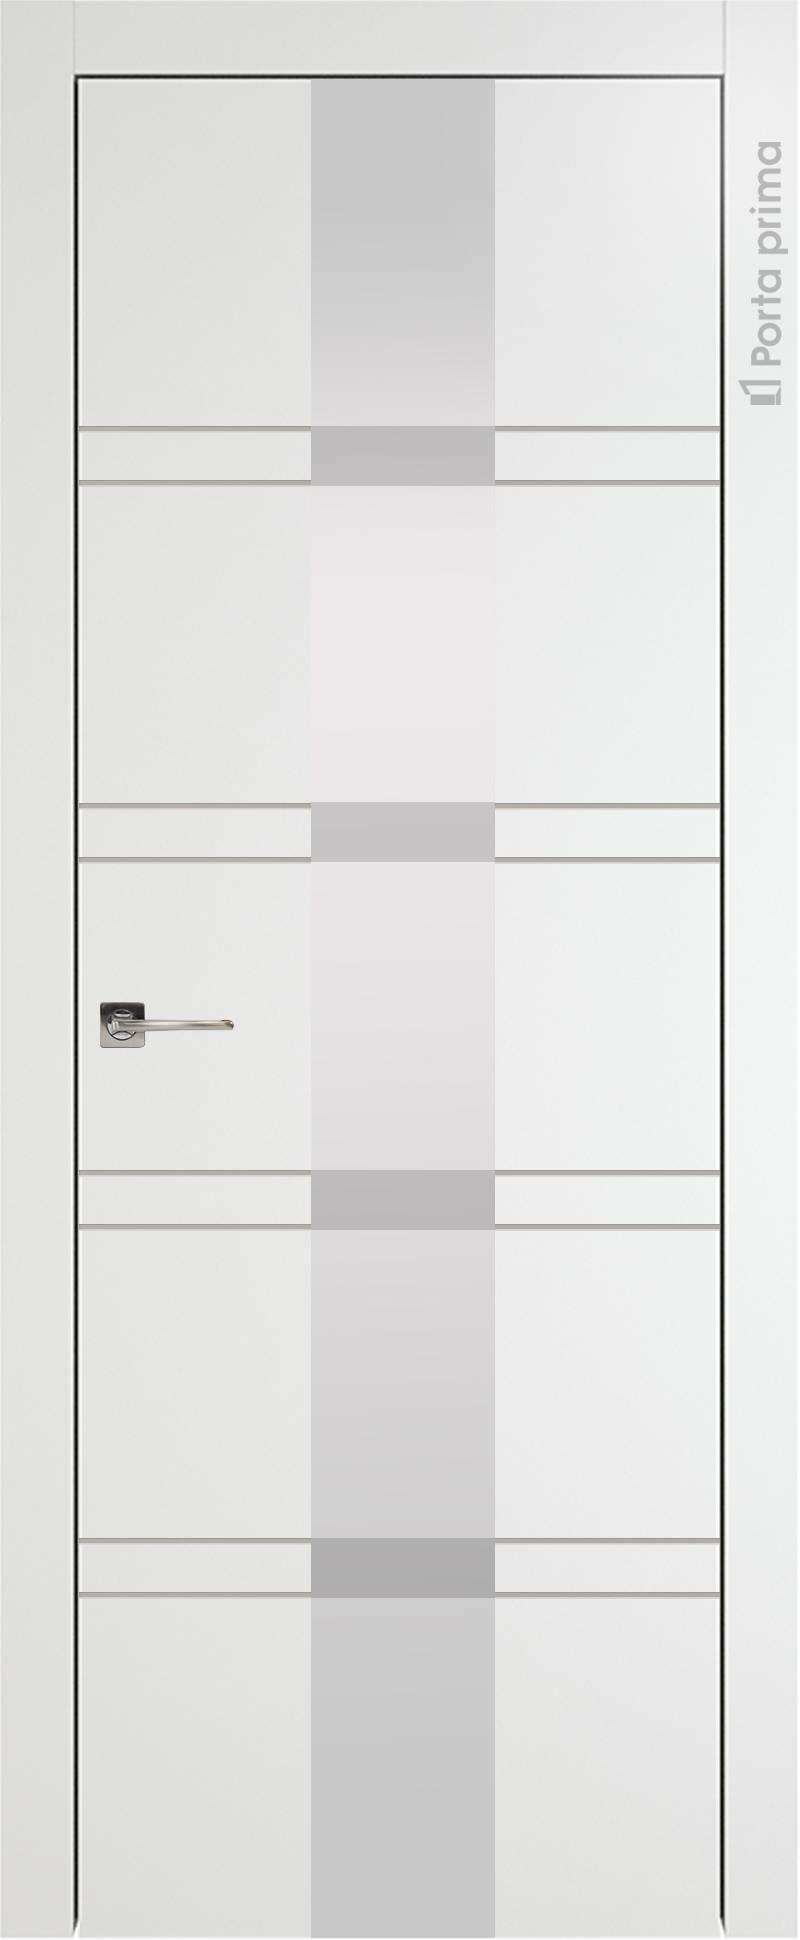 Tivoli Ж-4 цвет - Белая эмаль (RAL 9003) Со стеклом (ДО)